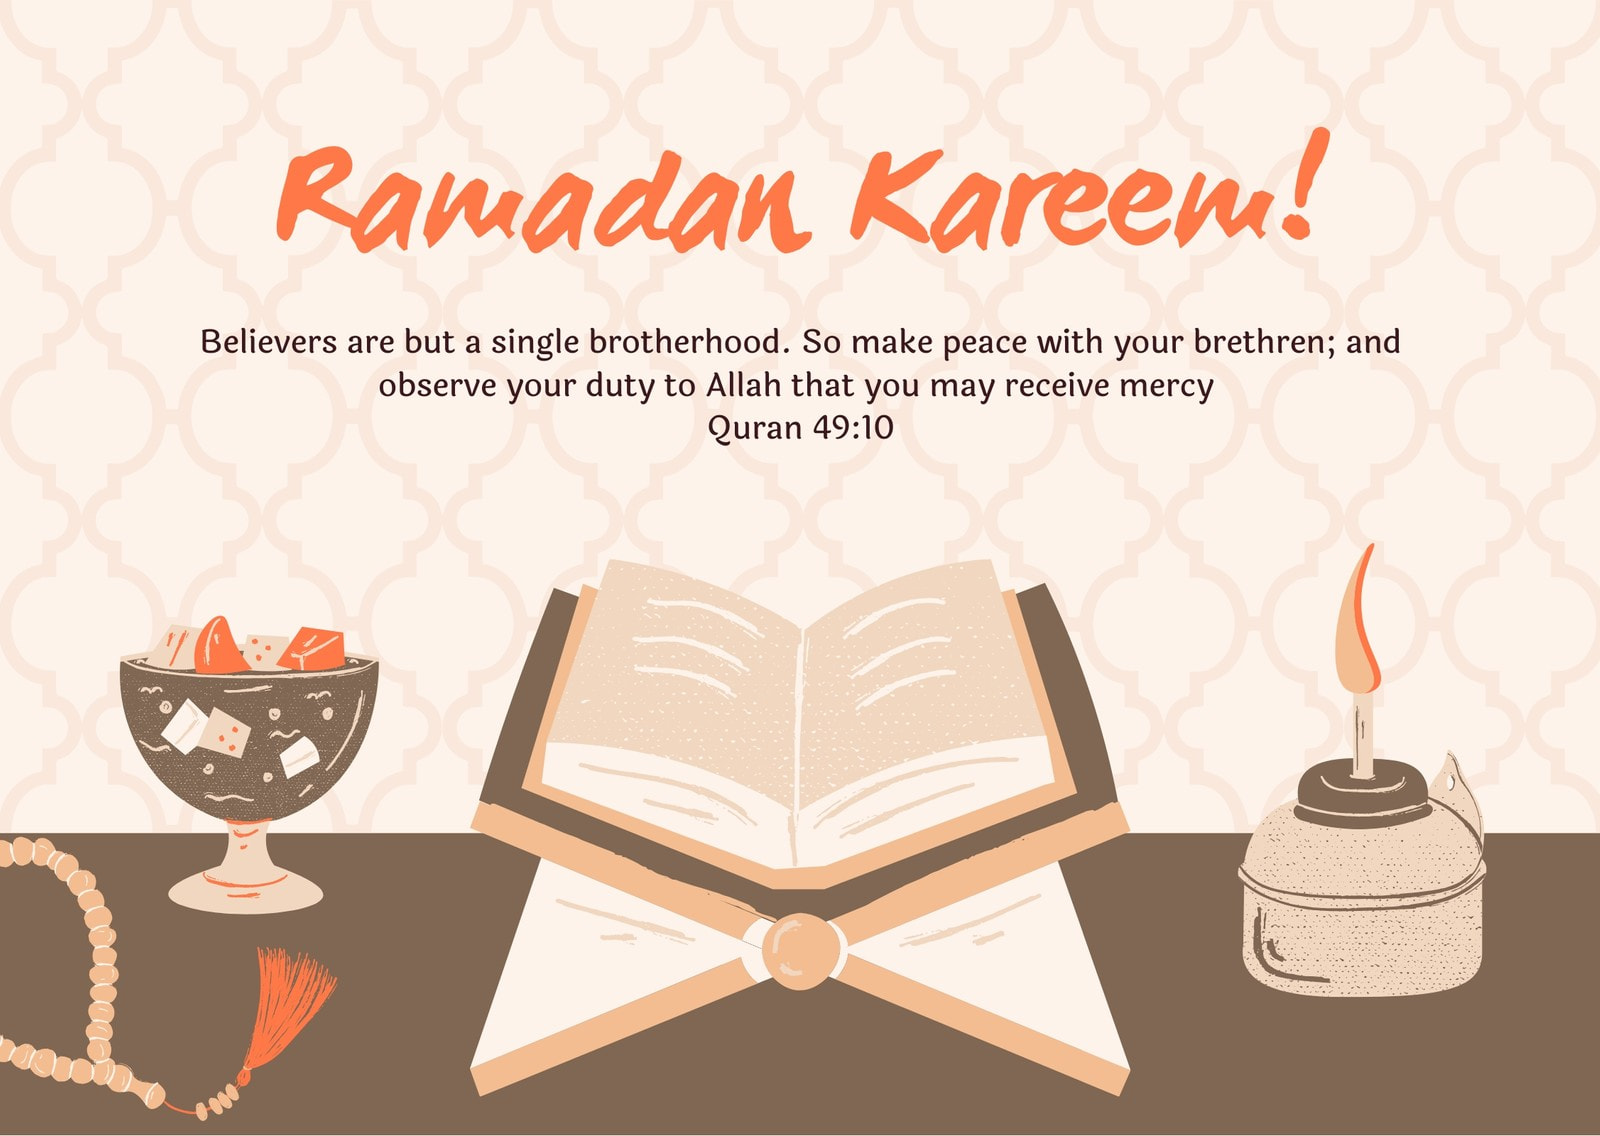 Khaki and Orange Quran Illustration Quote Eid al-Fitr Card